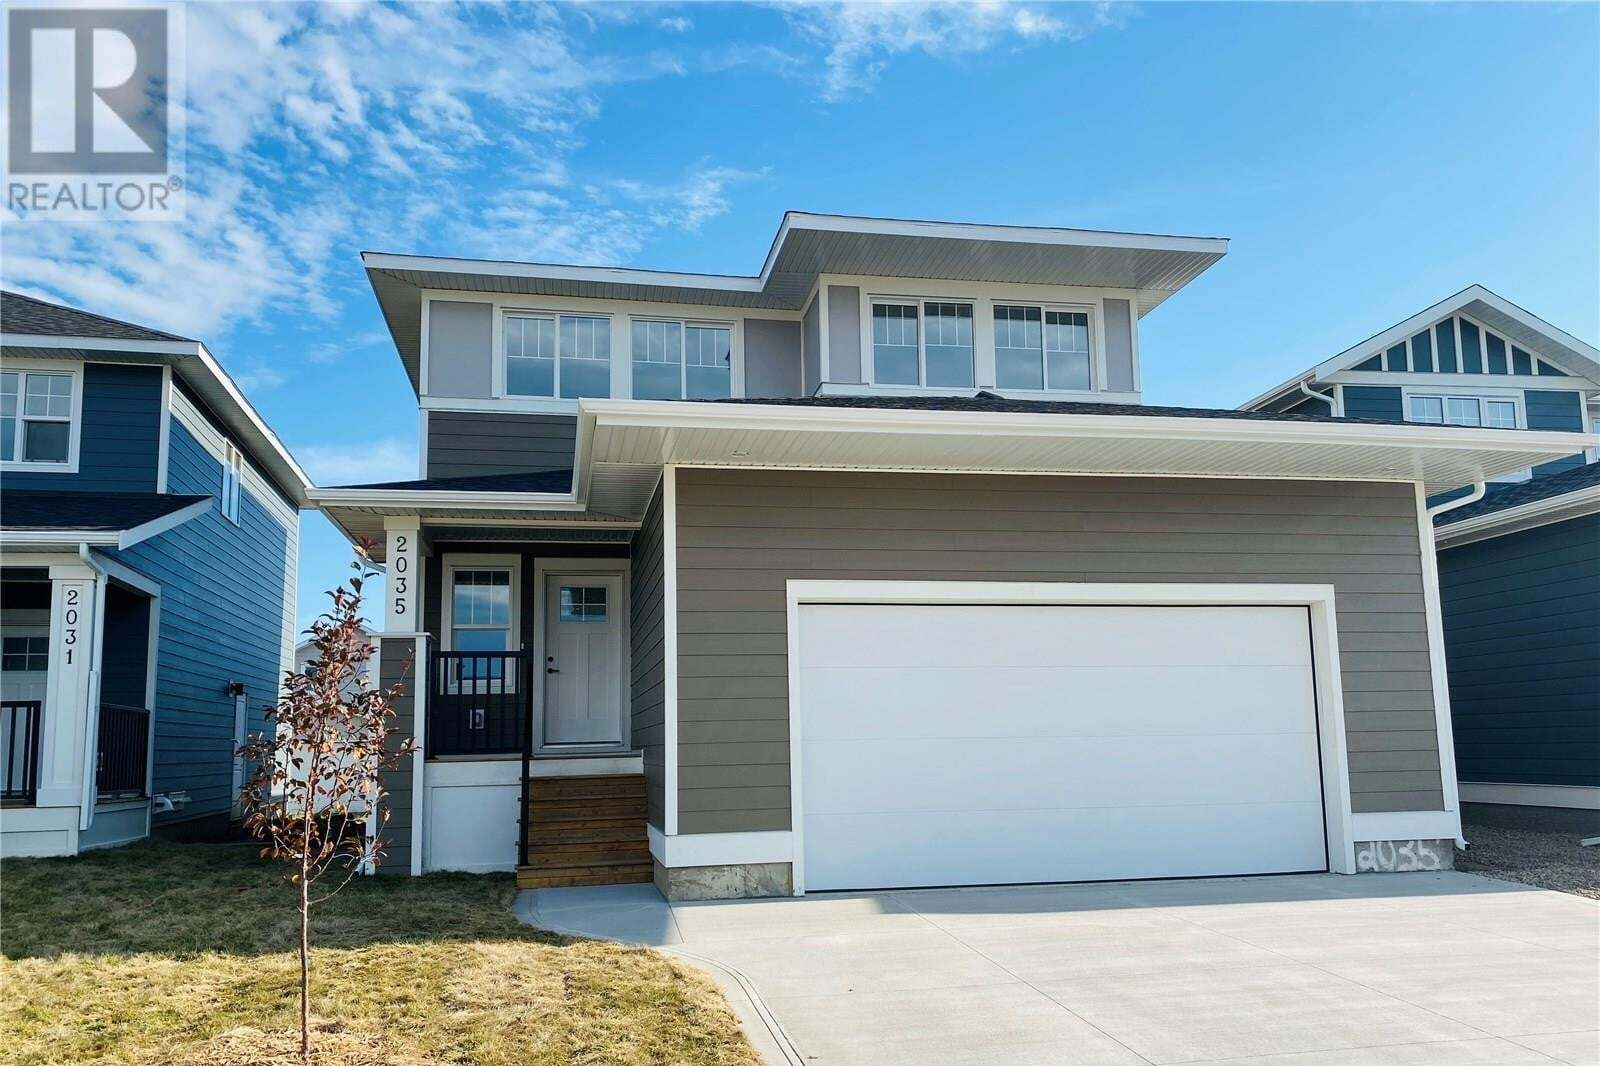 House for sale at 2035 Stilling Ln Saskatoon Saskatchewan - MLS: SK821136